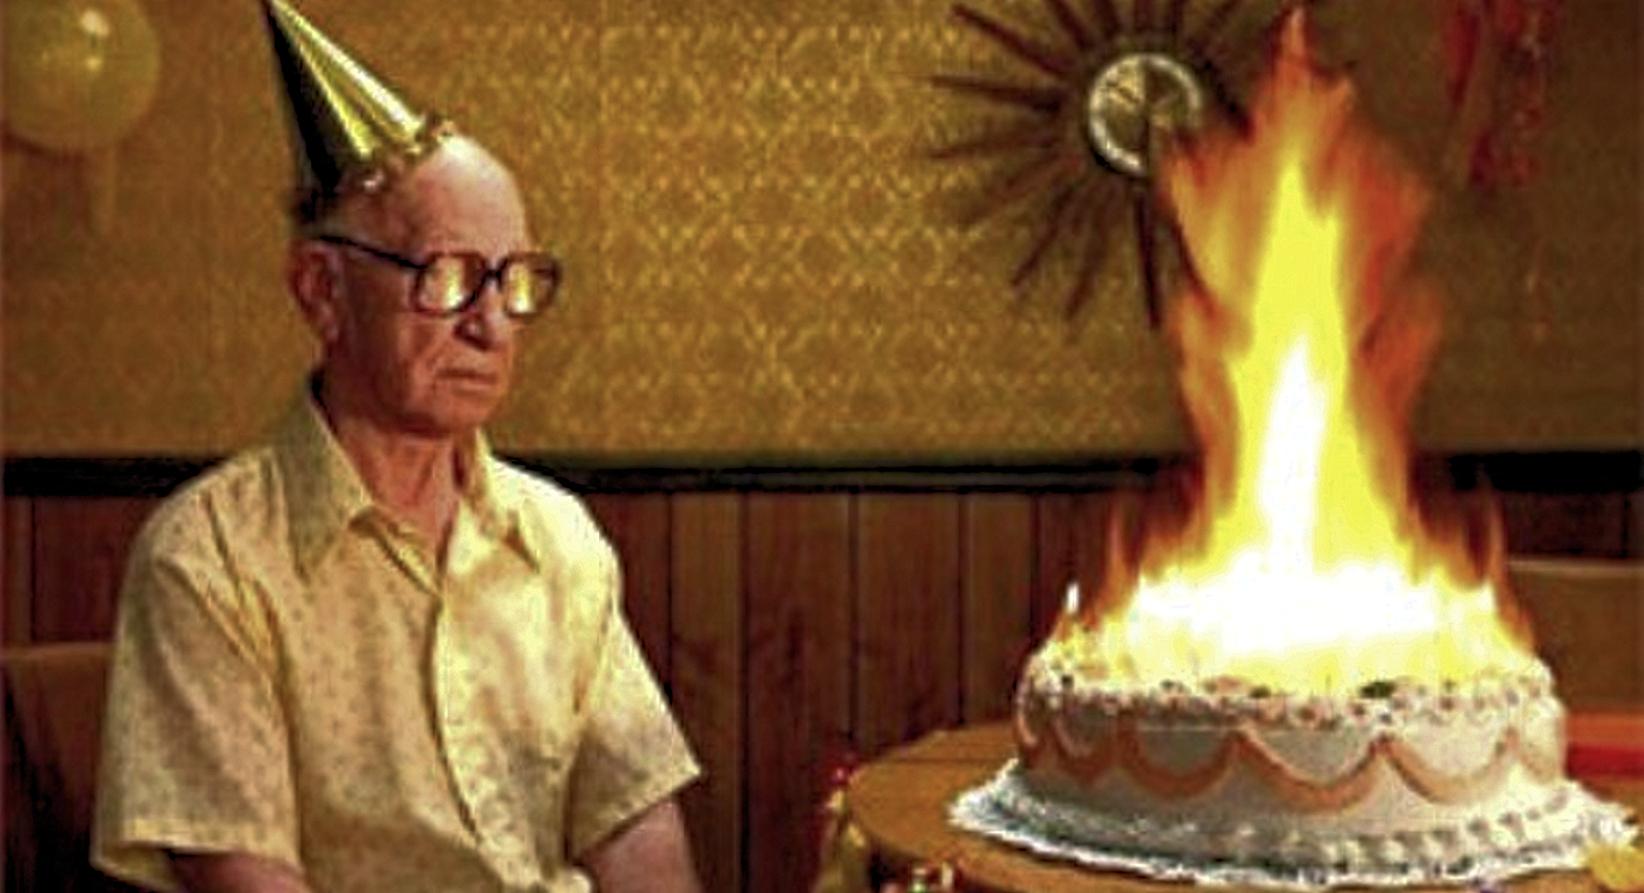 happy birthday old man blank template imgflip